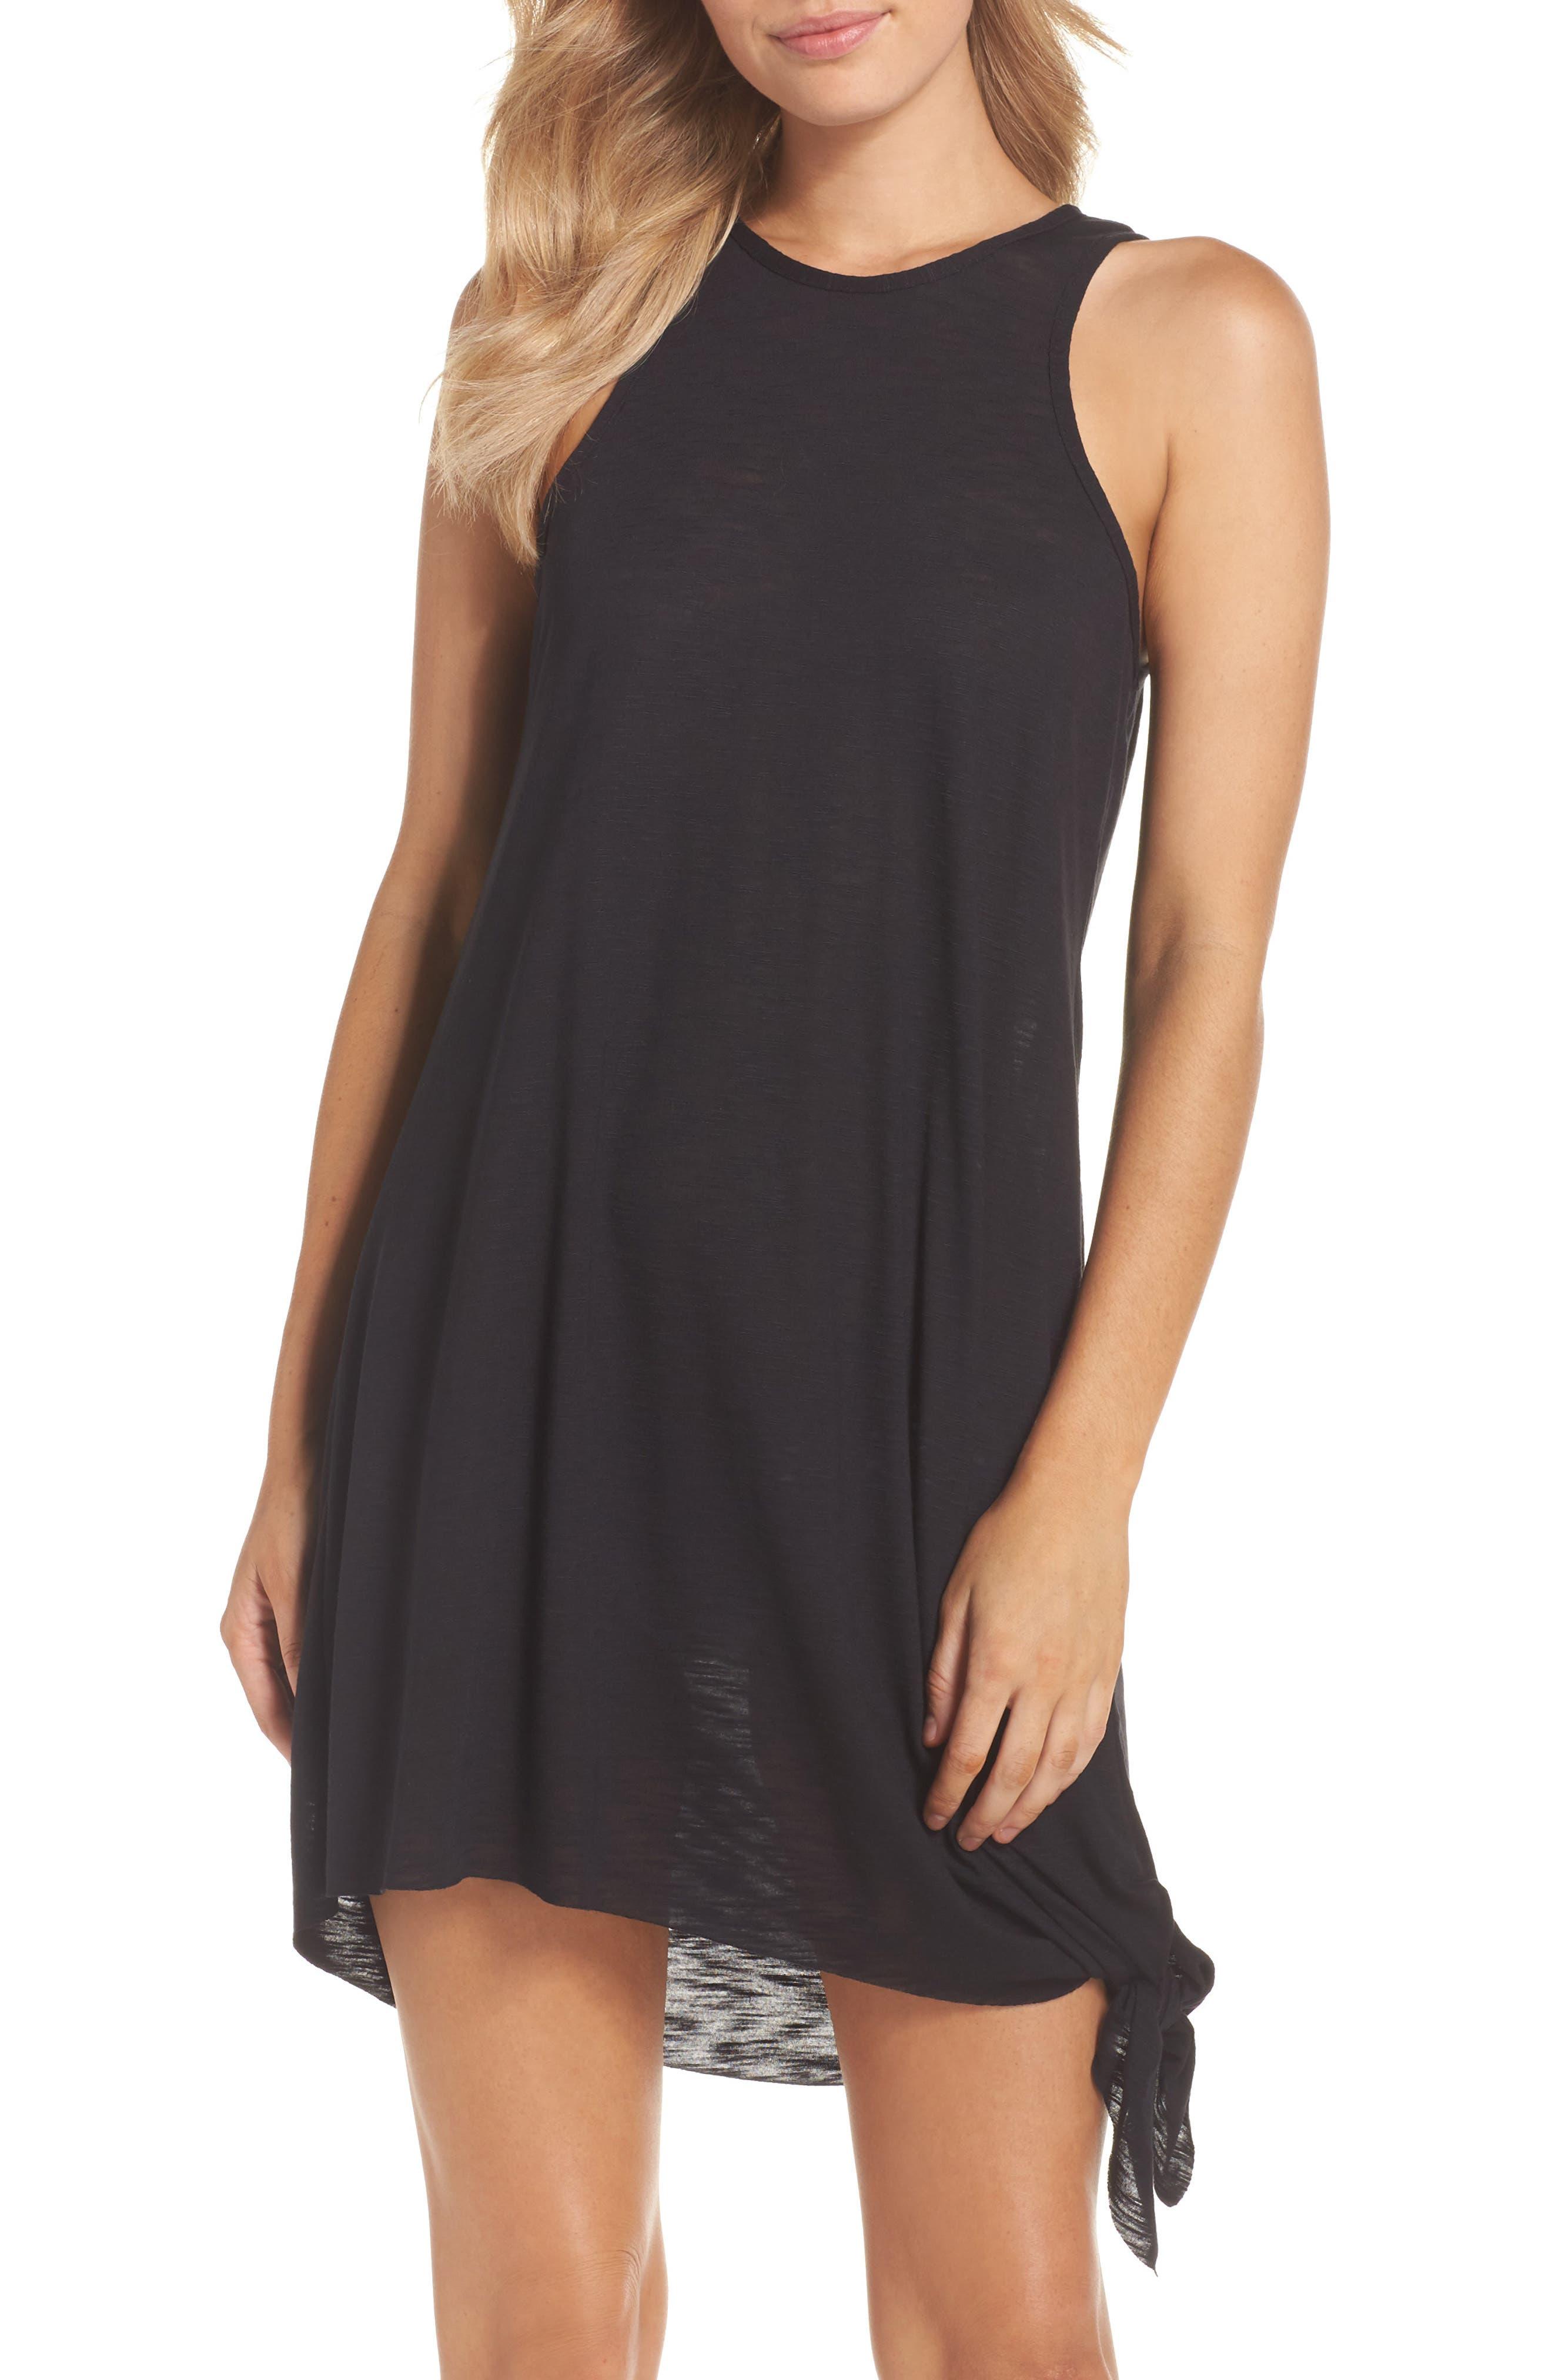 Becca Breezy Cover-Up Dress